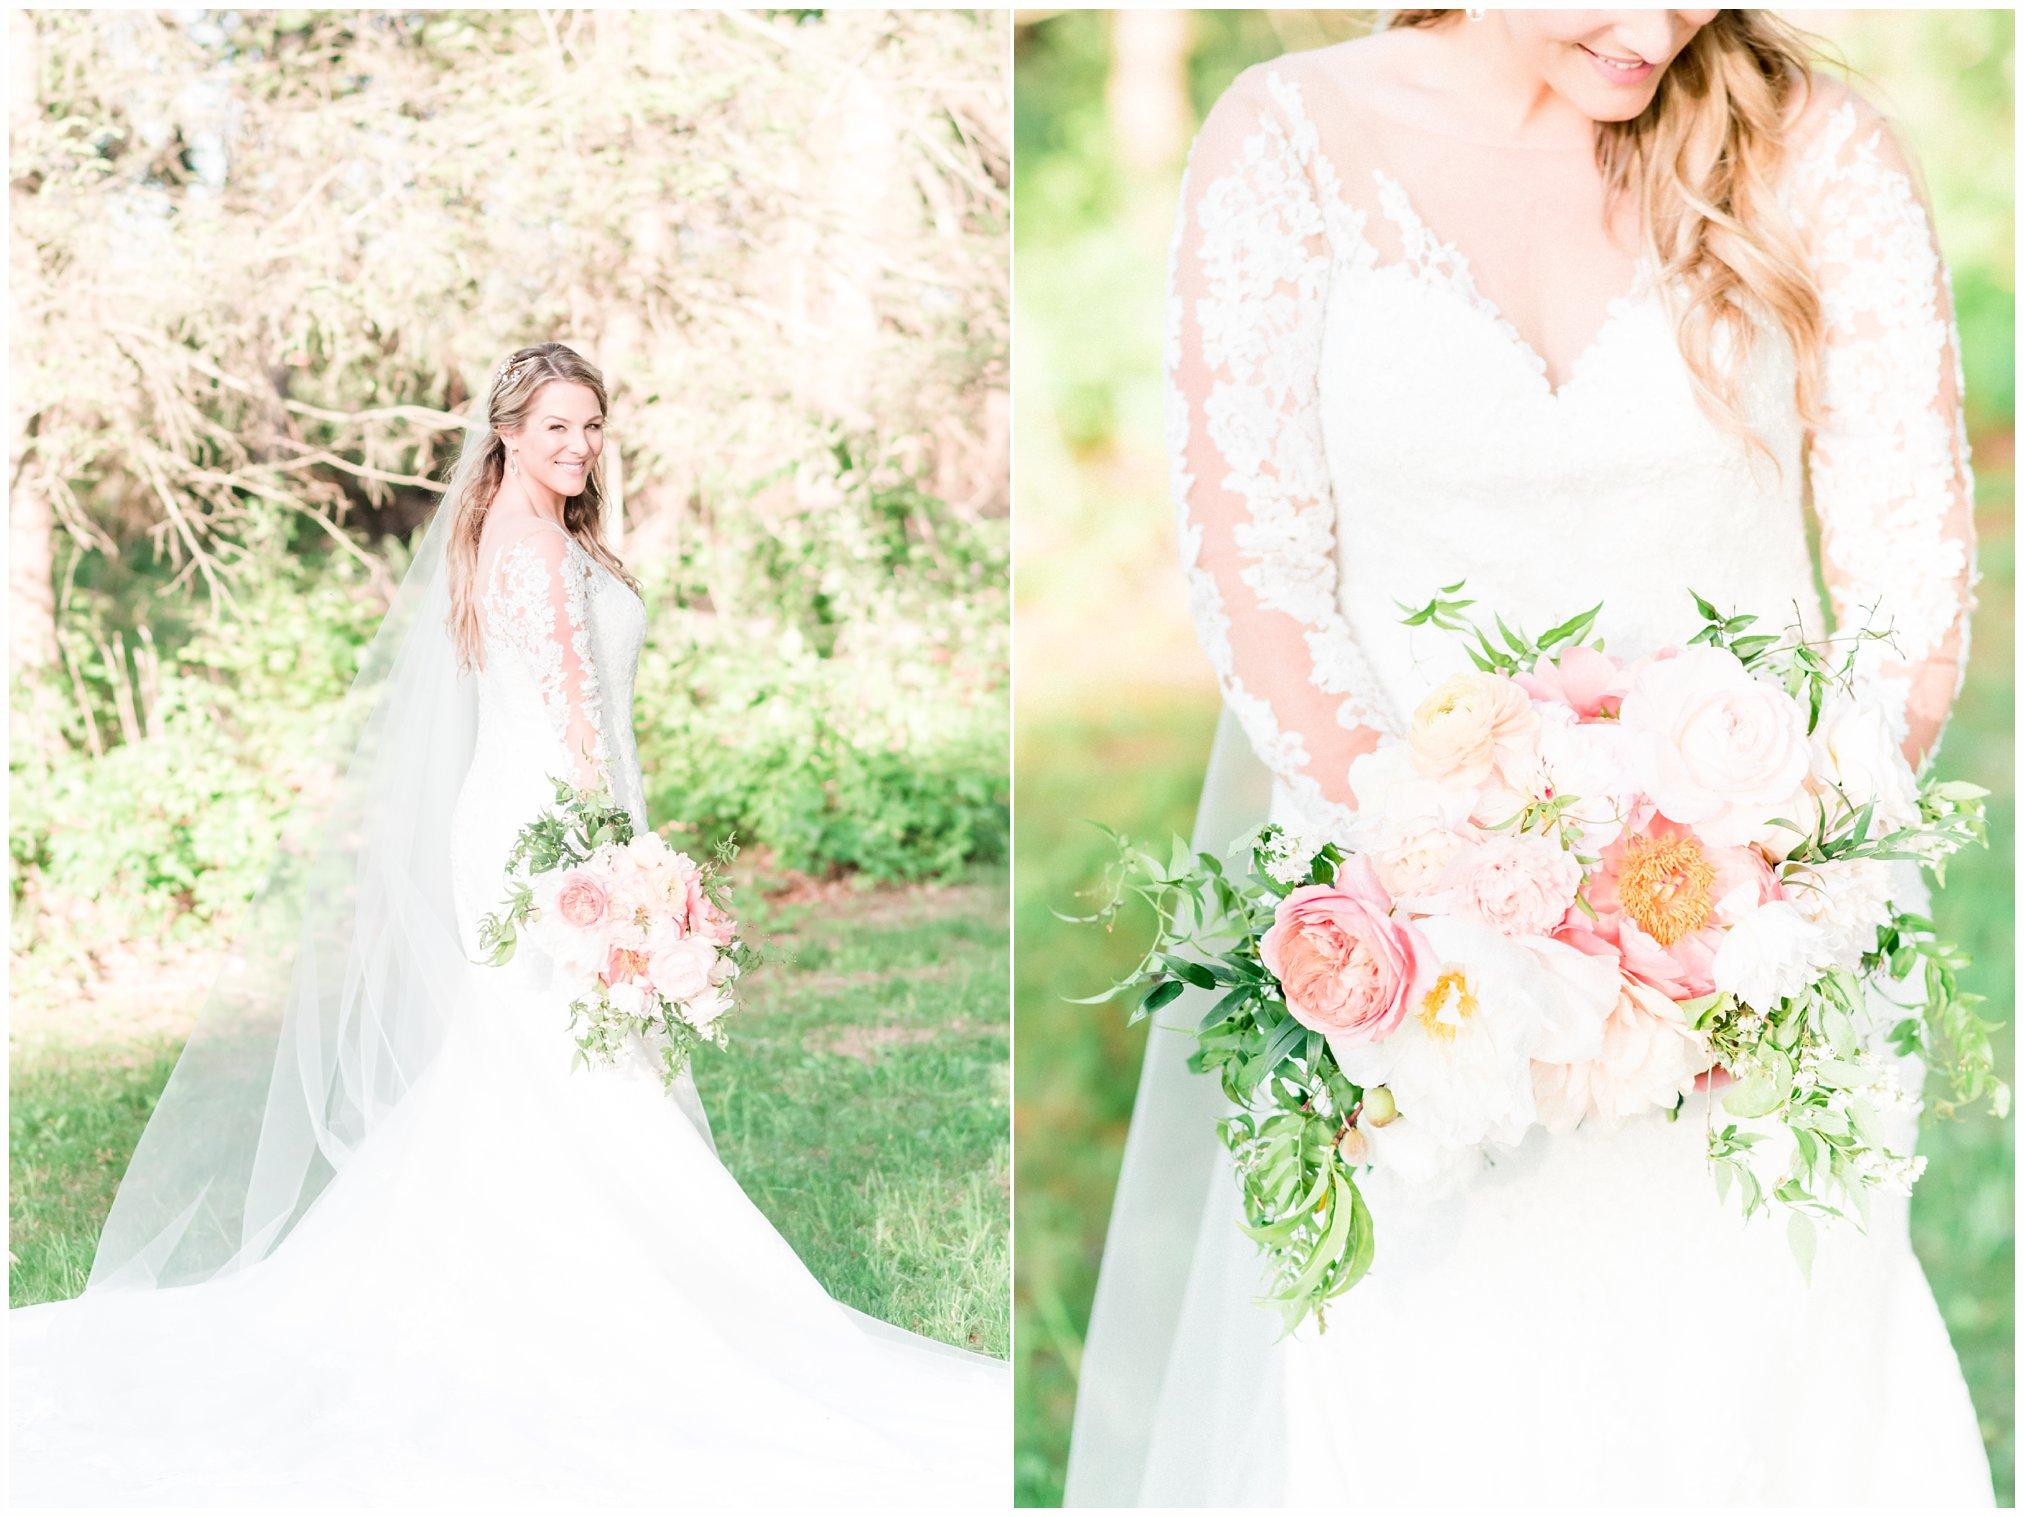 Ryland Inn Wedding | Susie + Tim_2726.jpg